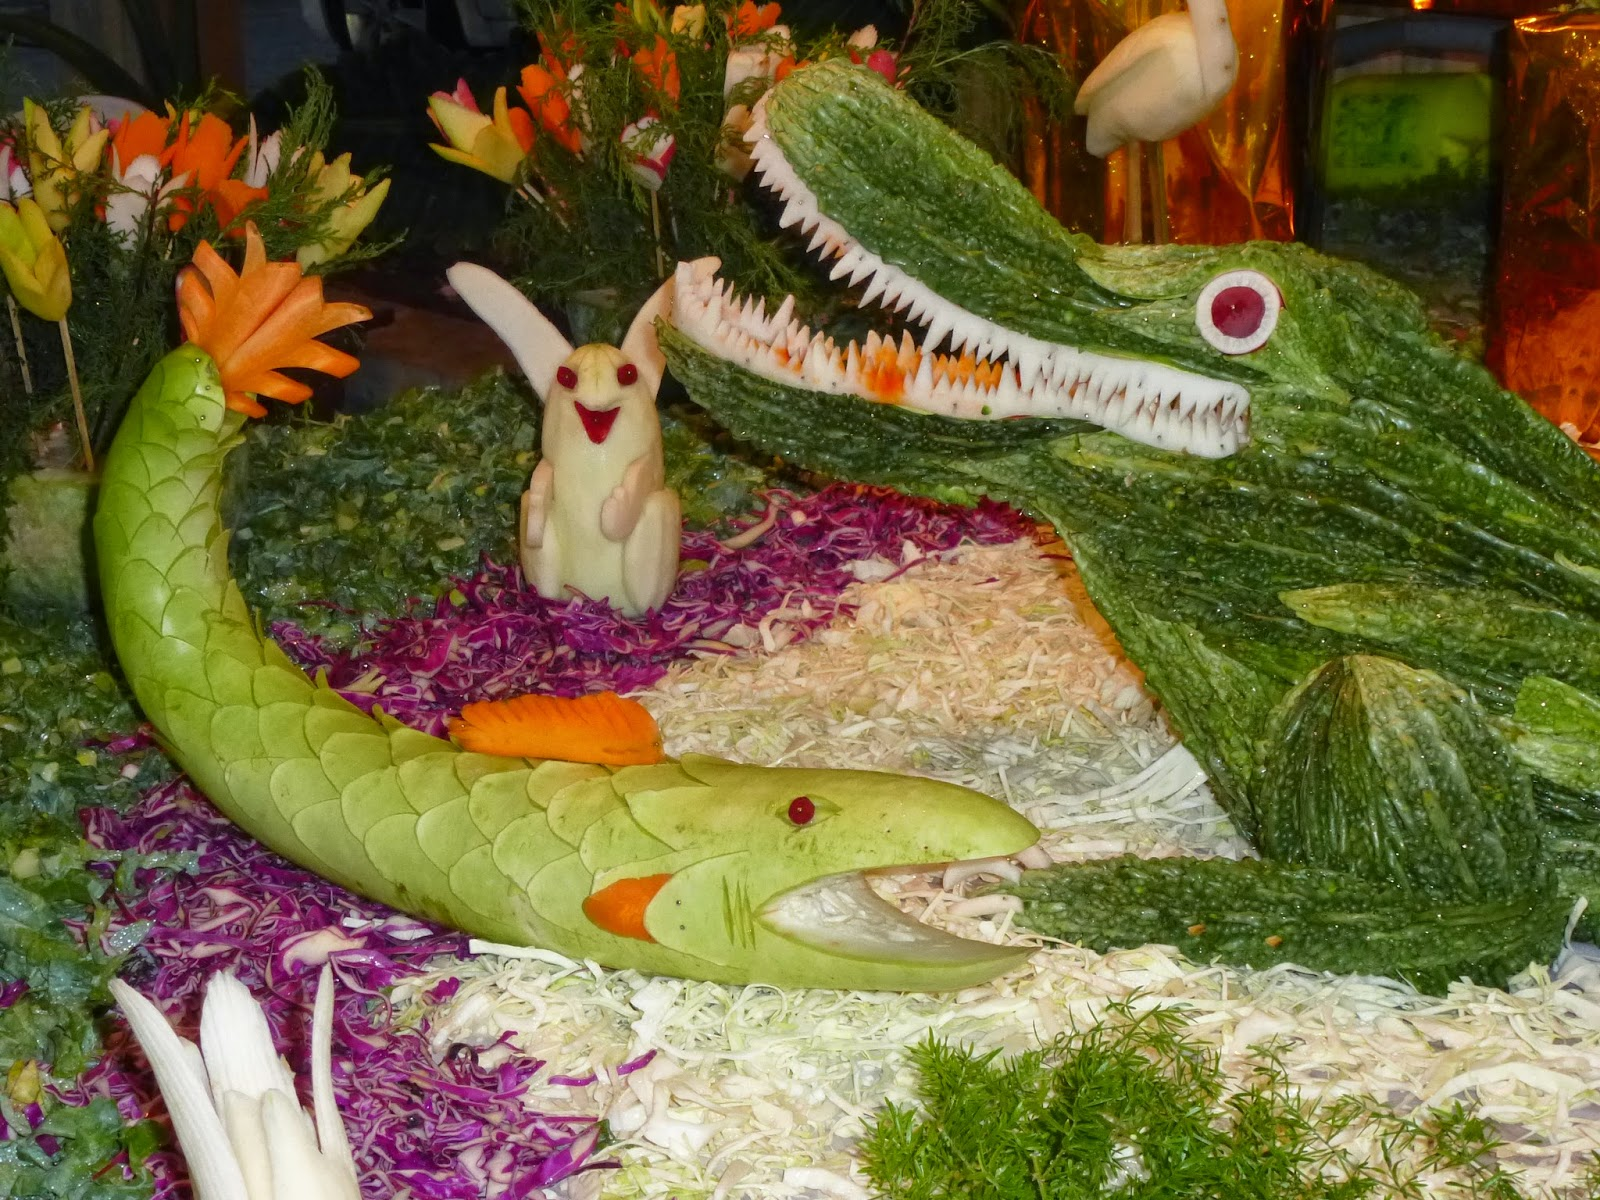 Vegetable carving for competition - Brinjal Flower Vase Vegetable Carvings Recipe